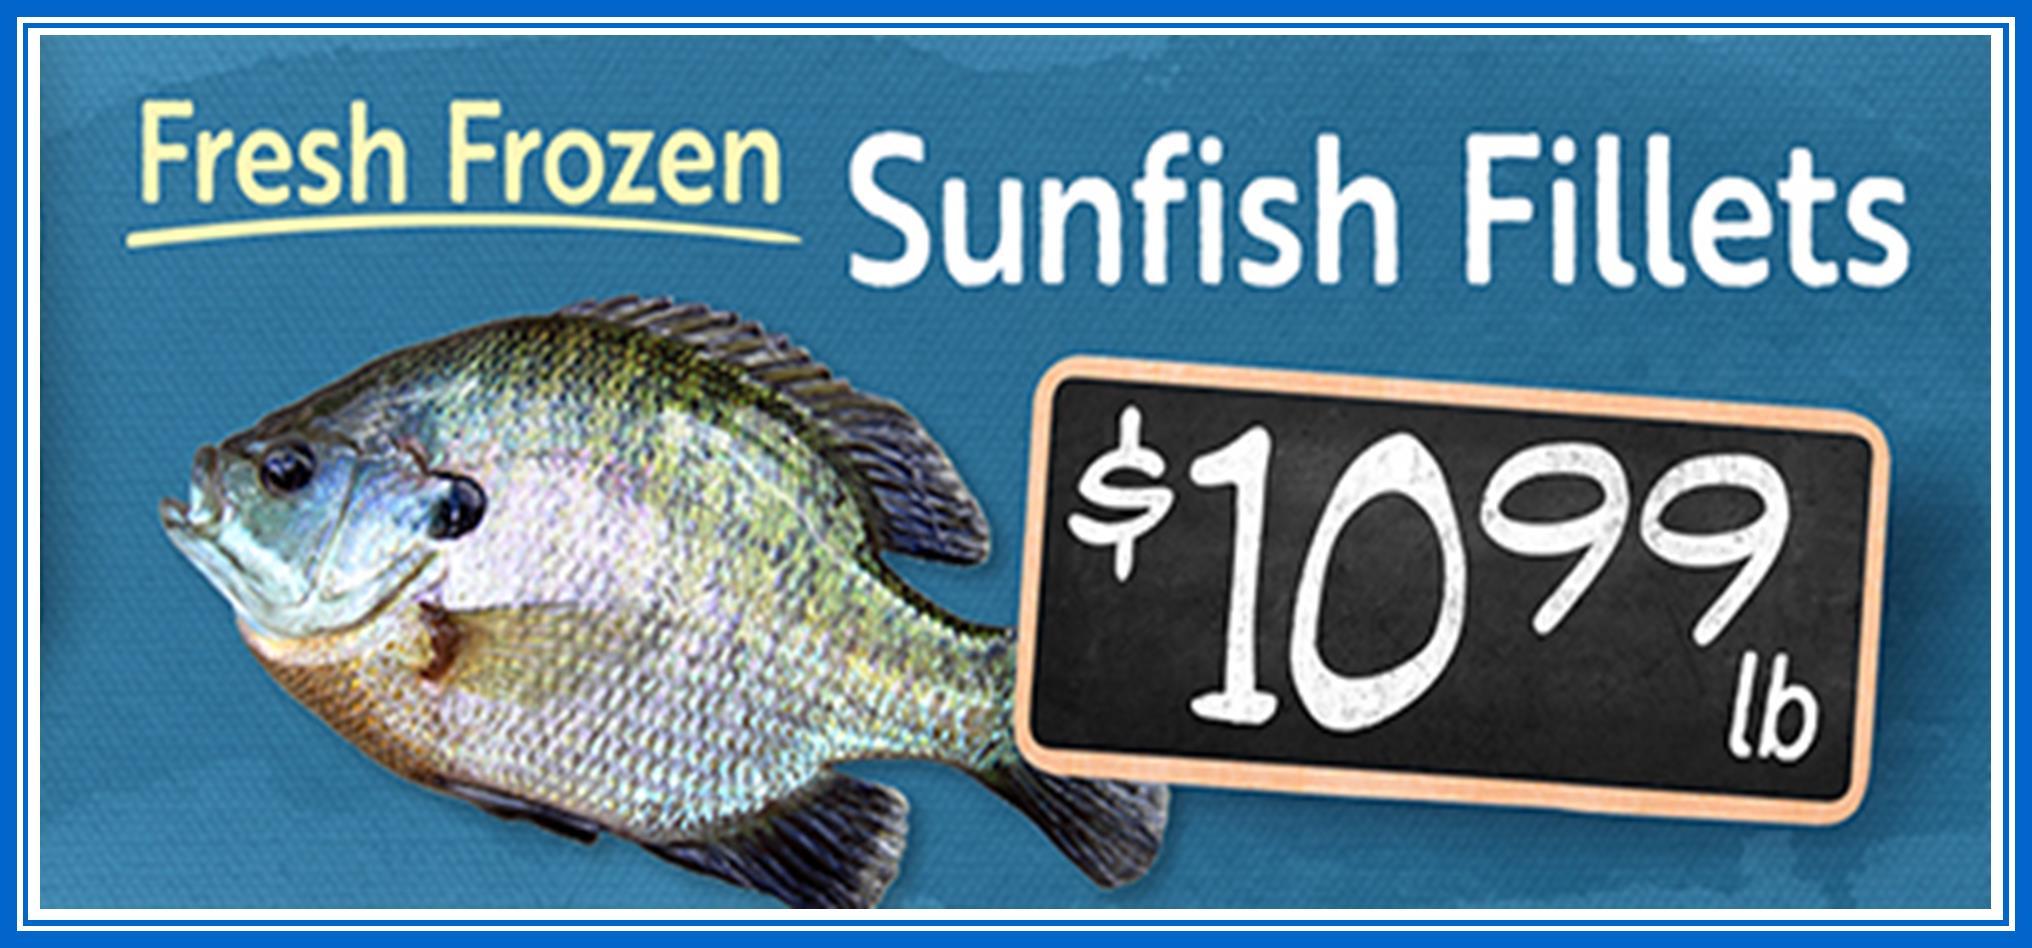 Sunfish Fillets 1099.jpg